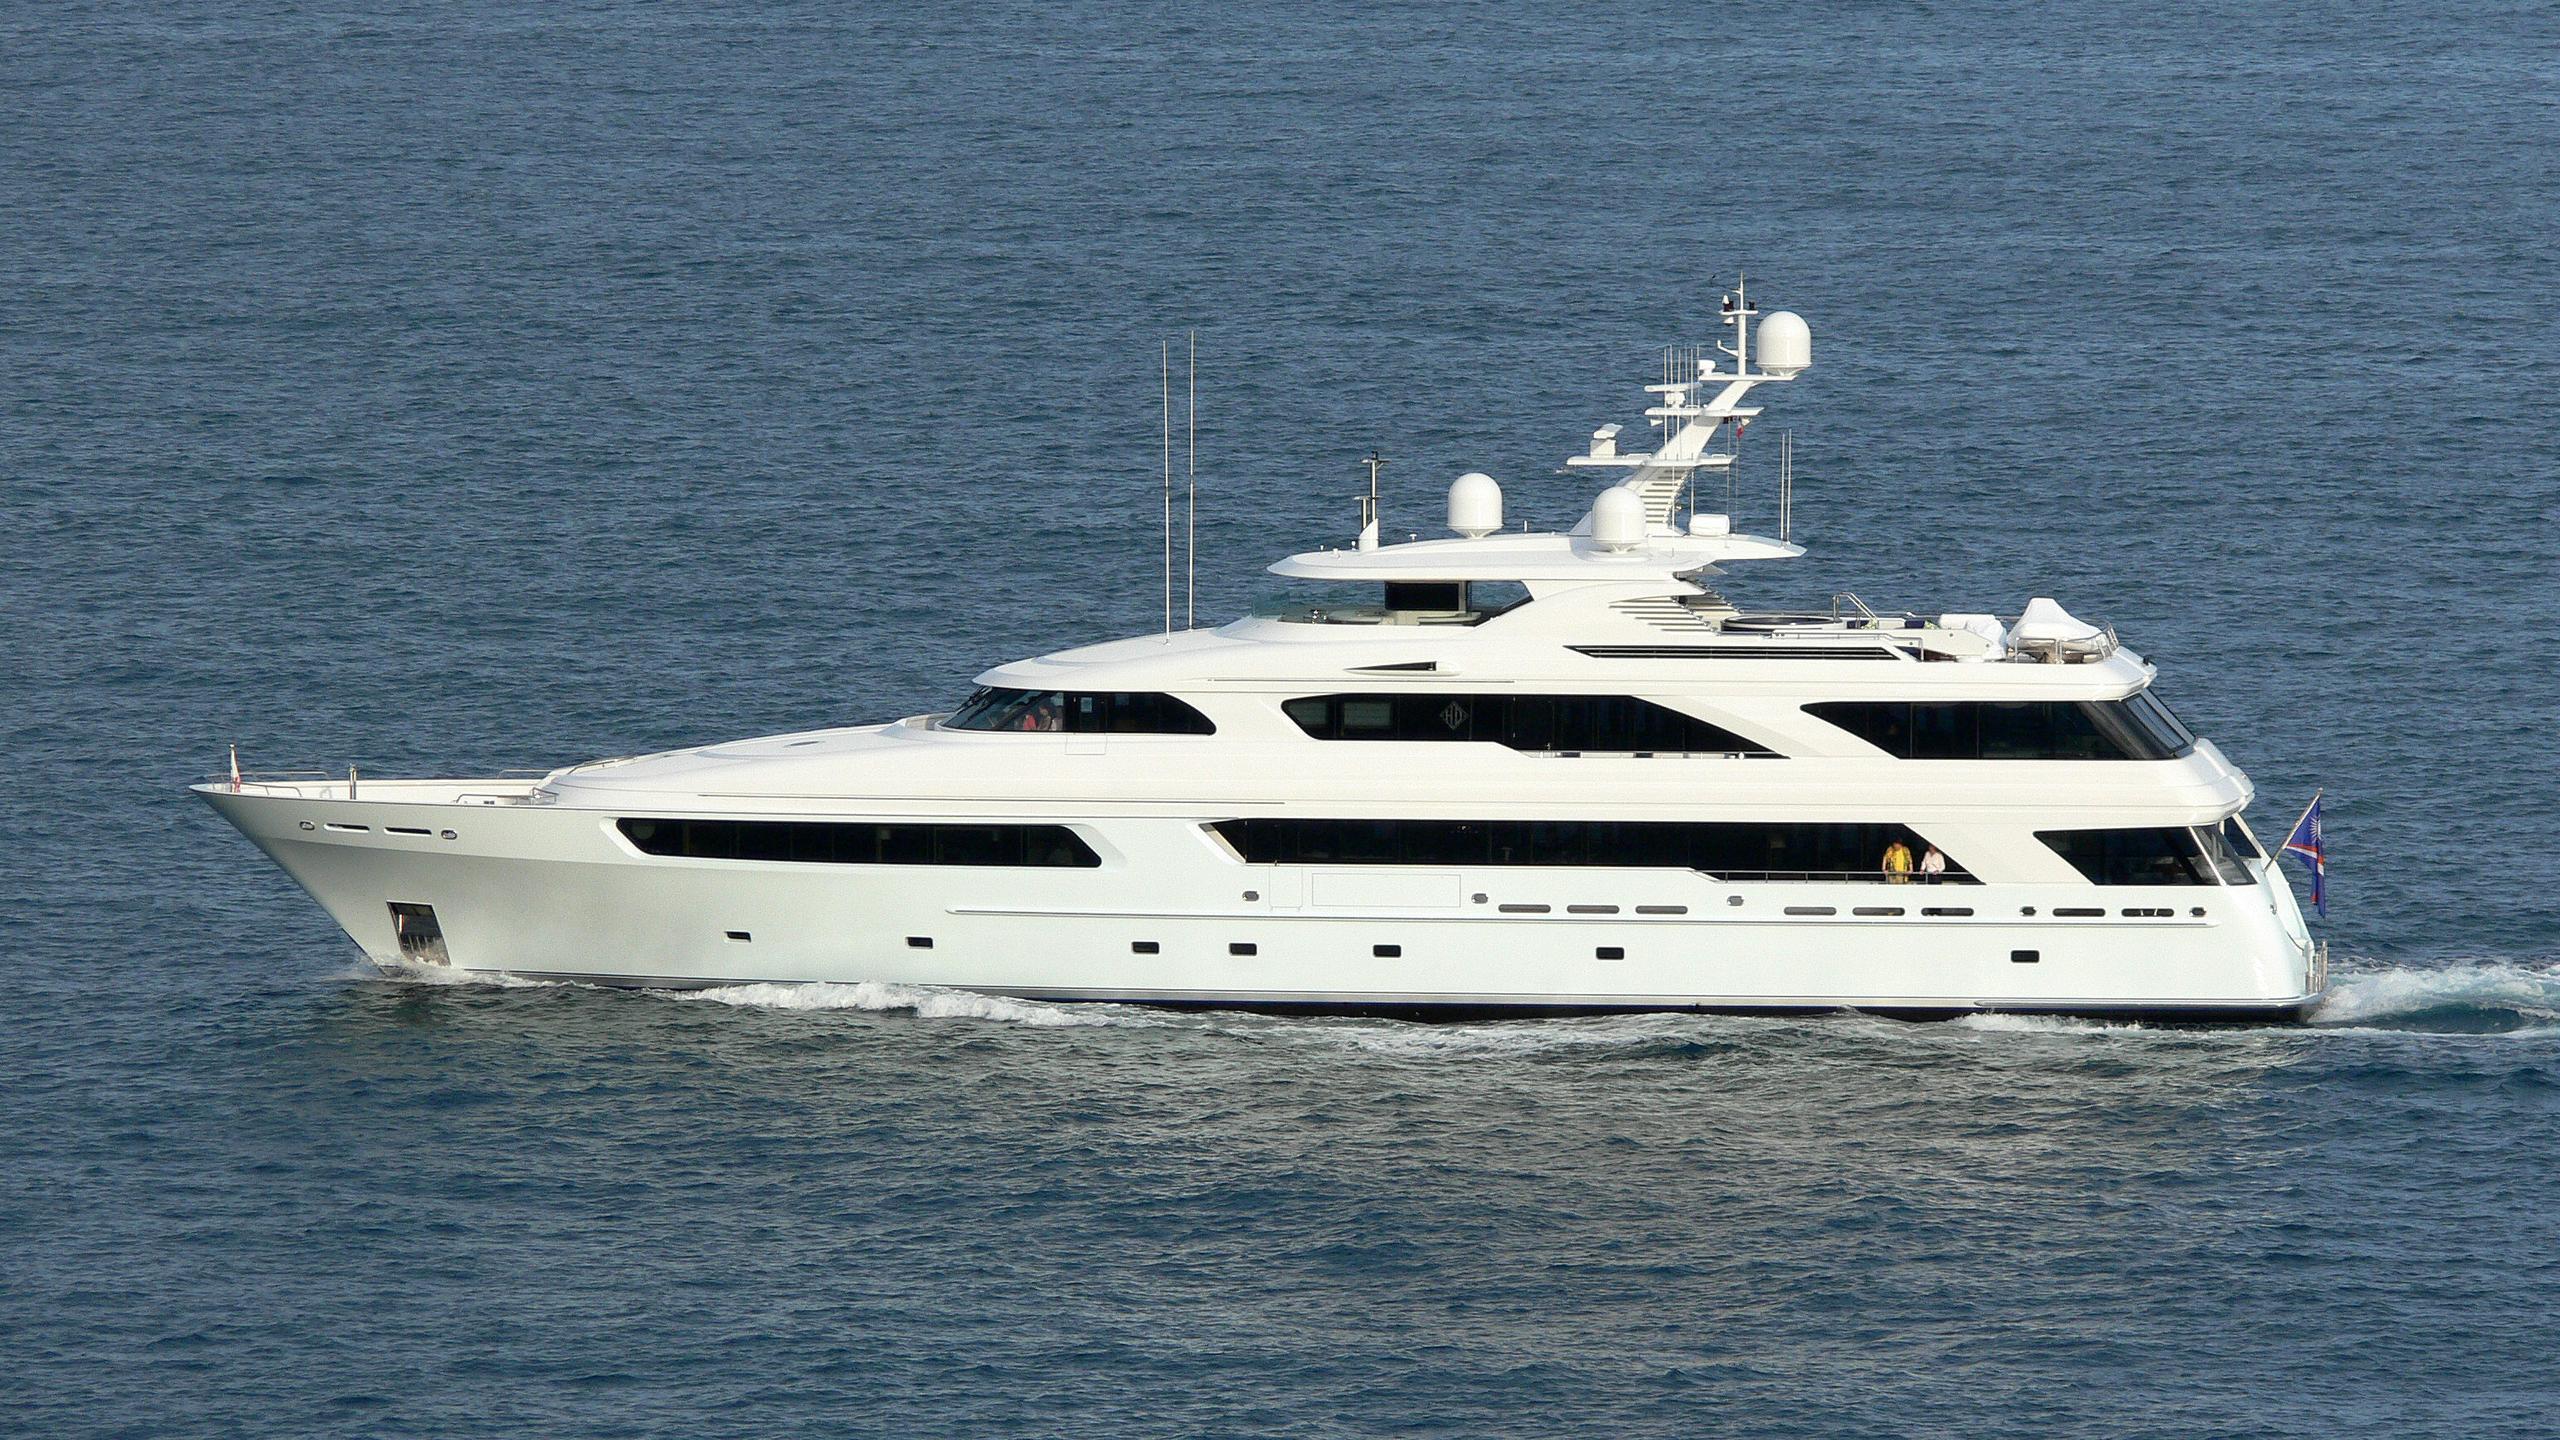 victoria-del-mar-ii-motor-yacht-delta-marine-2006-50m-profile